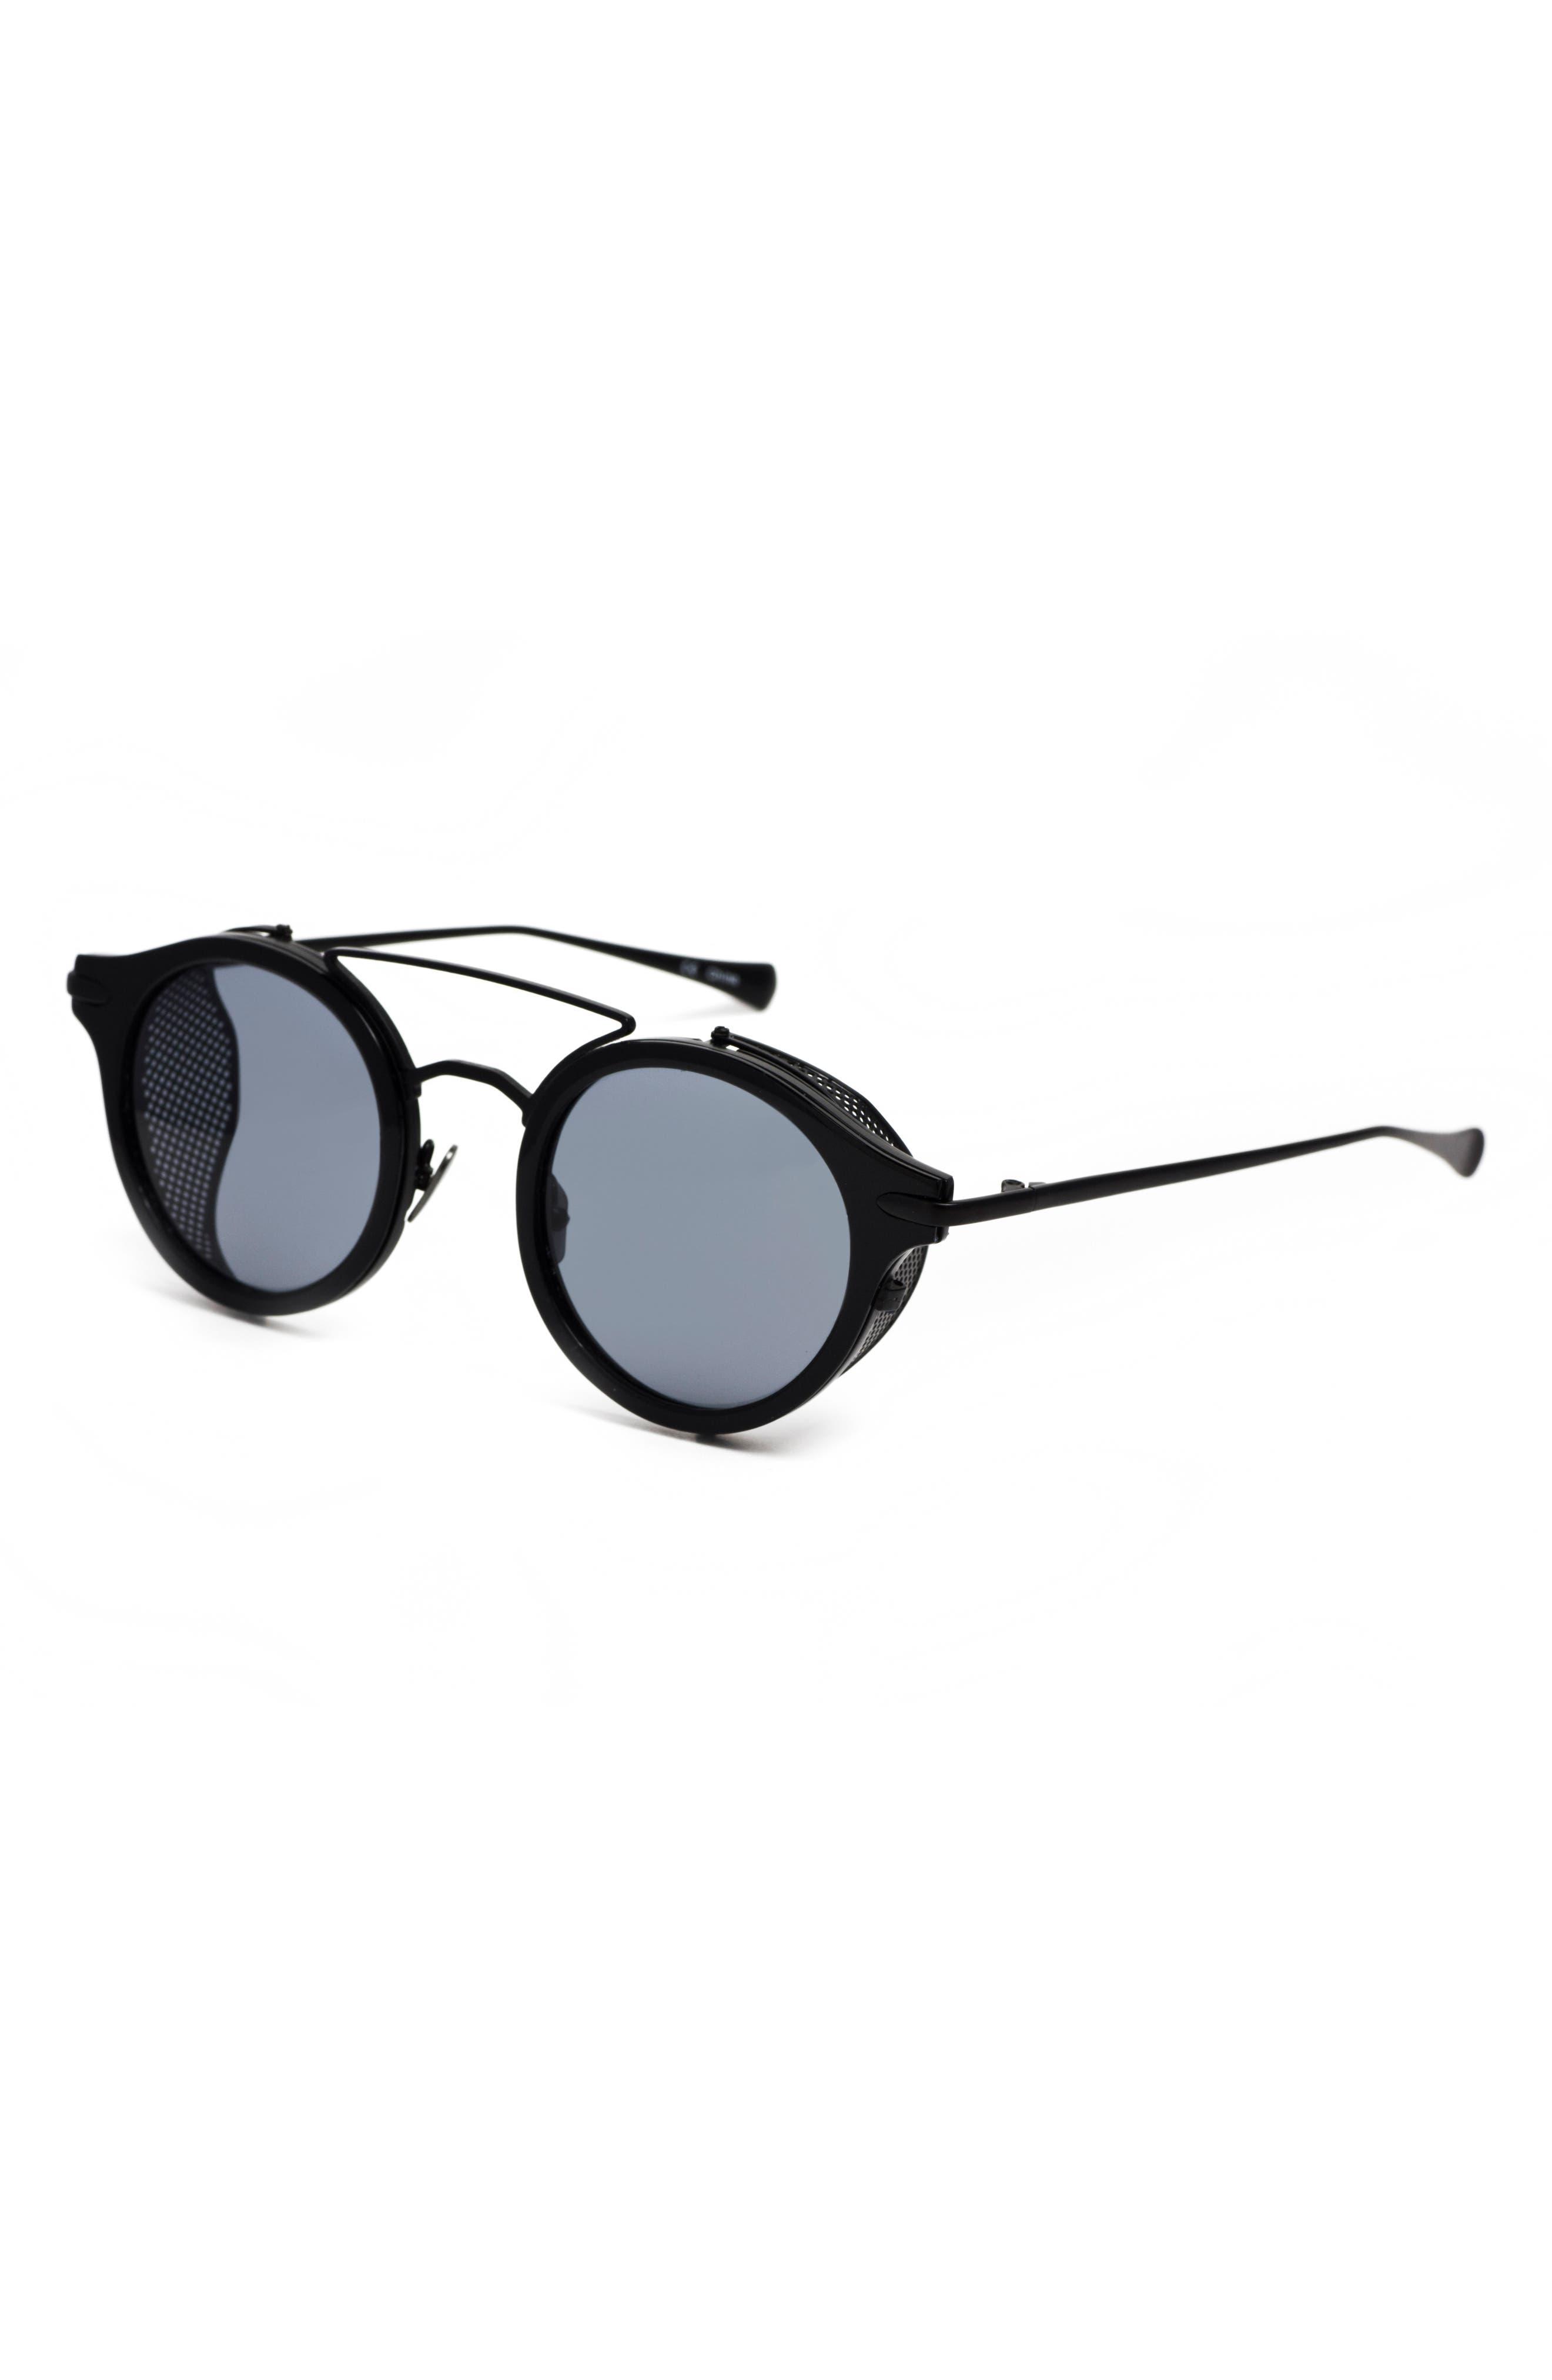 Mile High 47mm Sunglasses,                             Alternate thumbnail 4, color,                             001